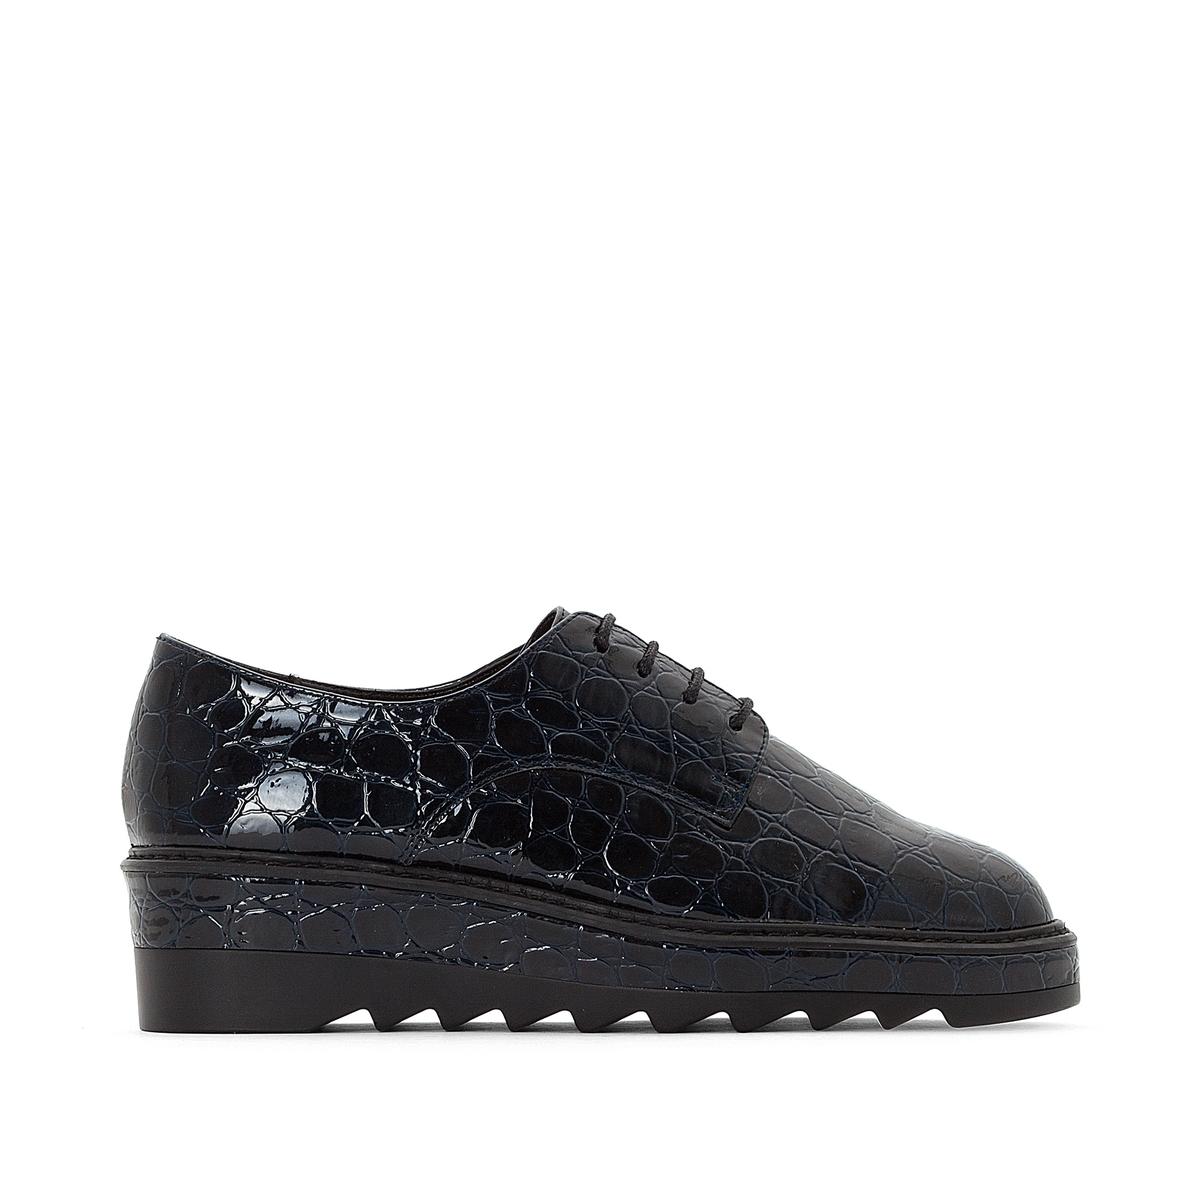 Ботинки-дерби под кожу крокодила